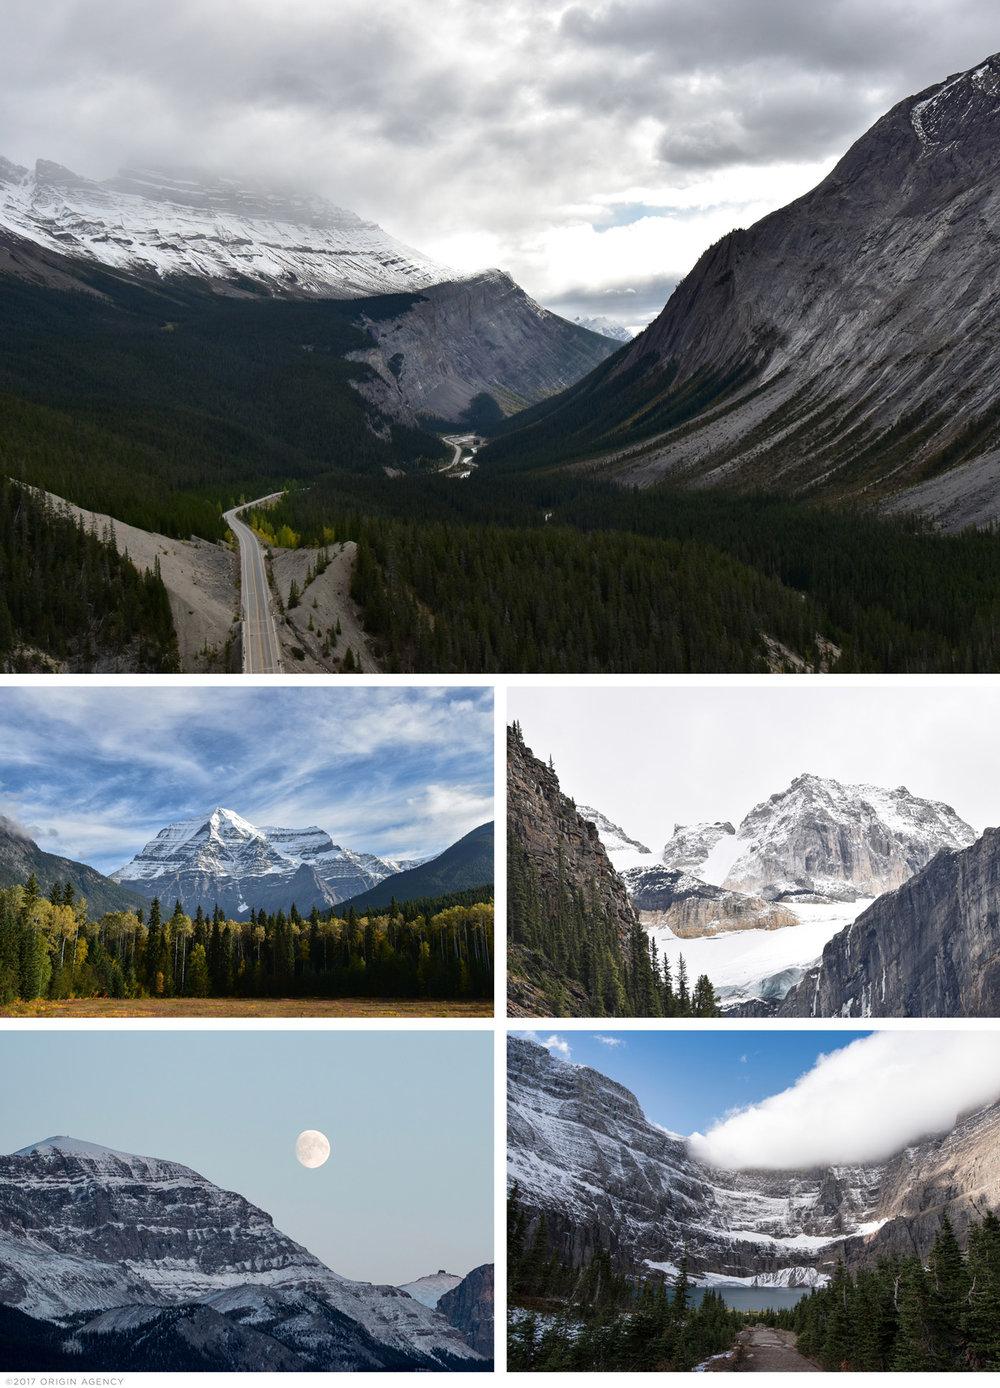 origin-agency-canada-mountains.jpg